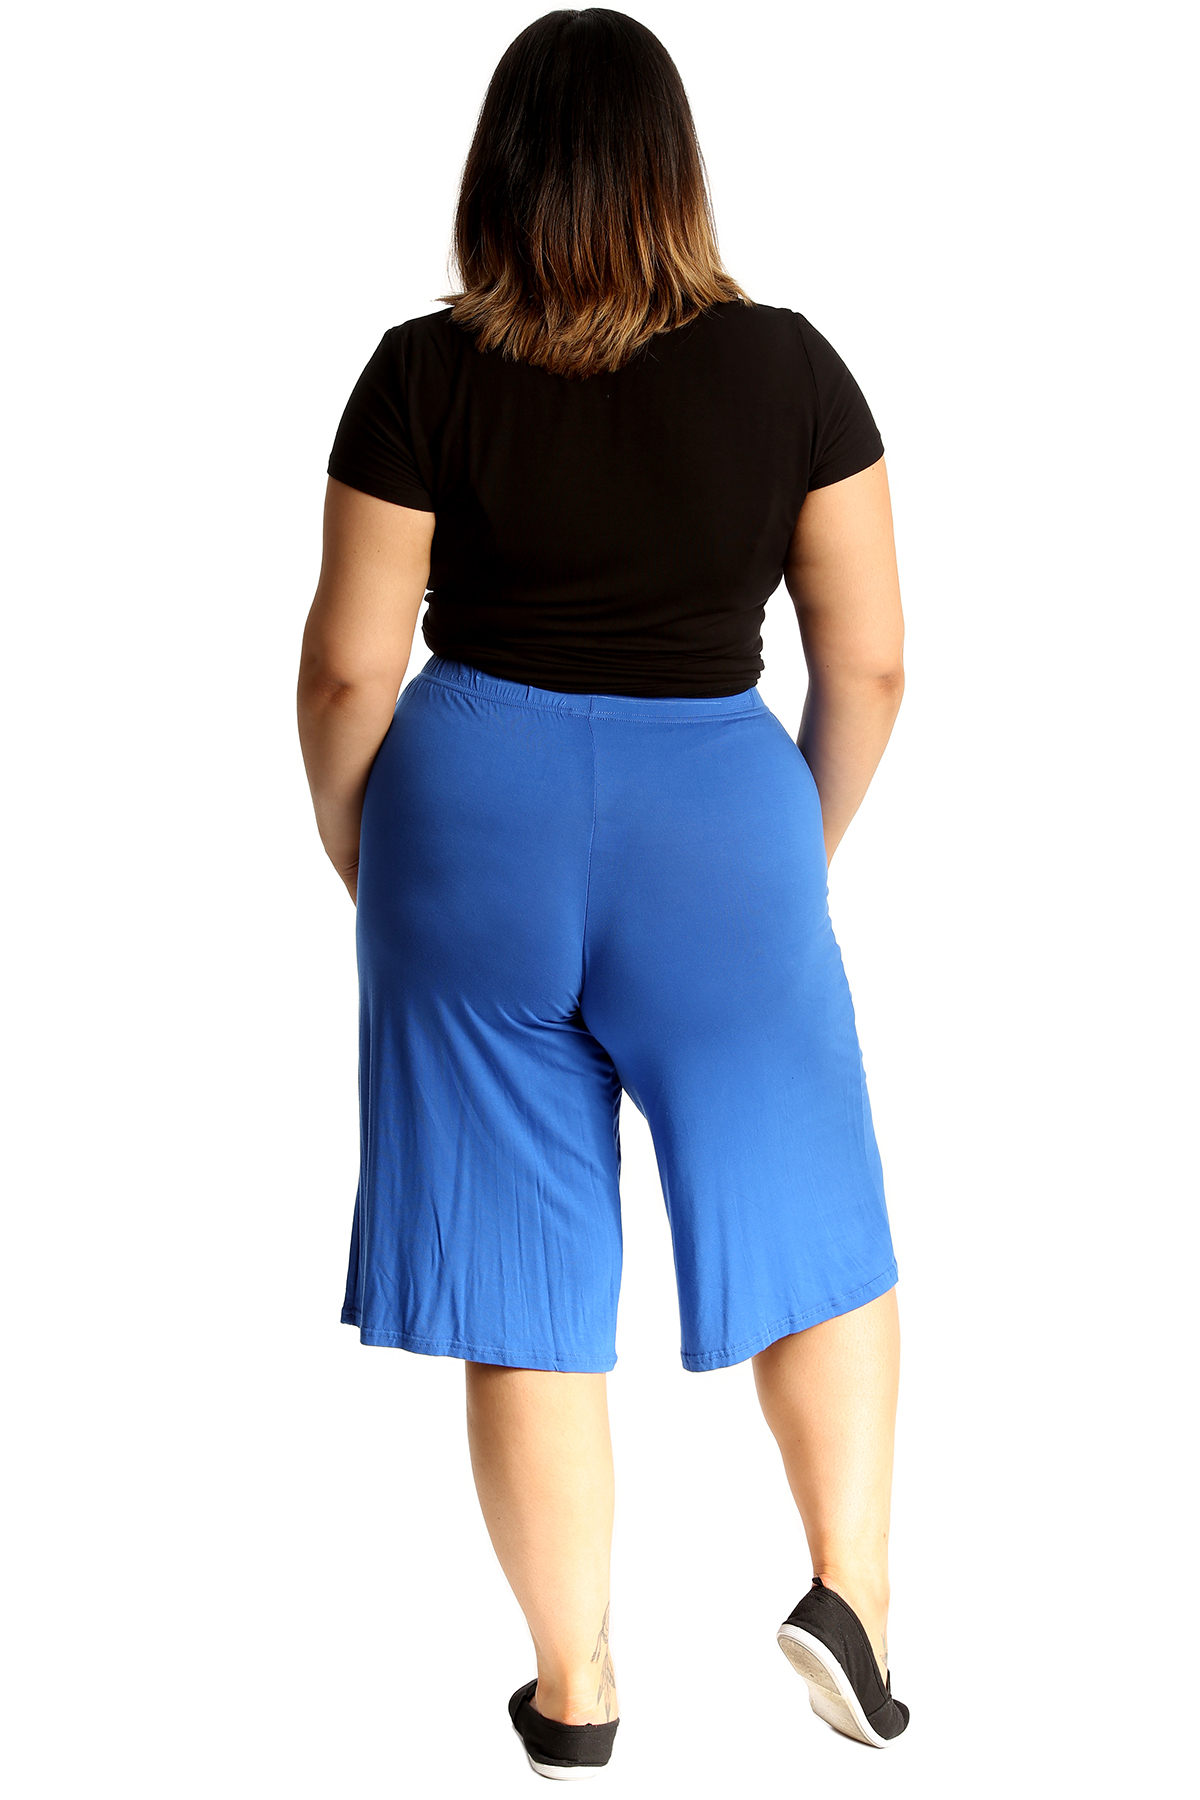 New-Womens-Plus-Size-Culottes-Ladies-Plain-Shorts-Palazzo-Elastic-Pants-Summer thumbnail 48